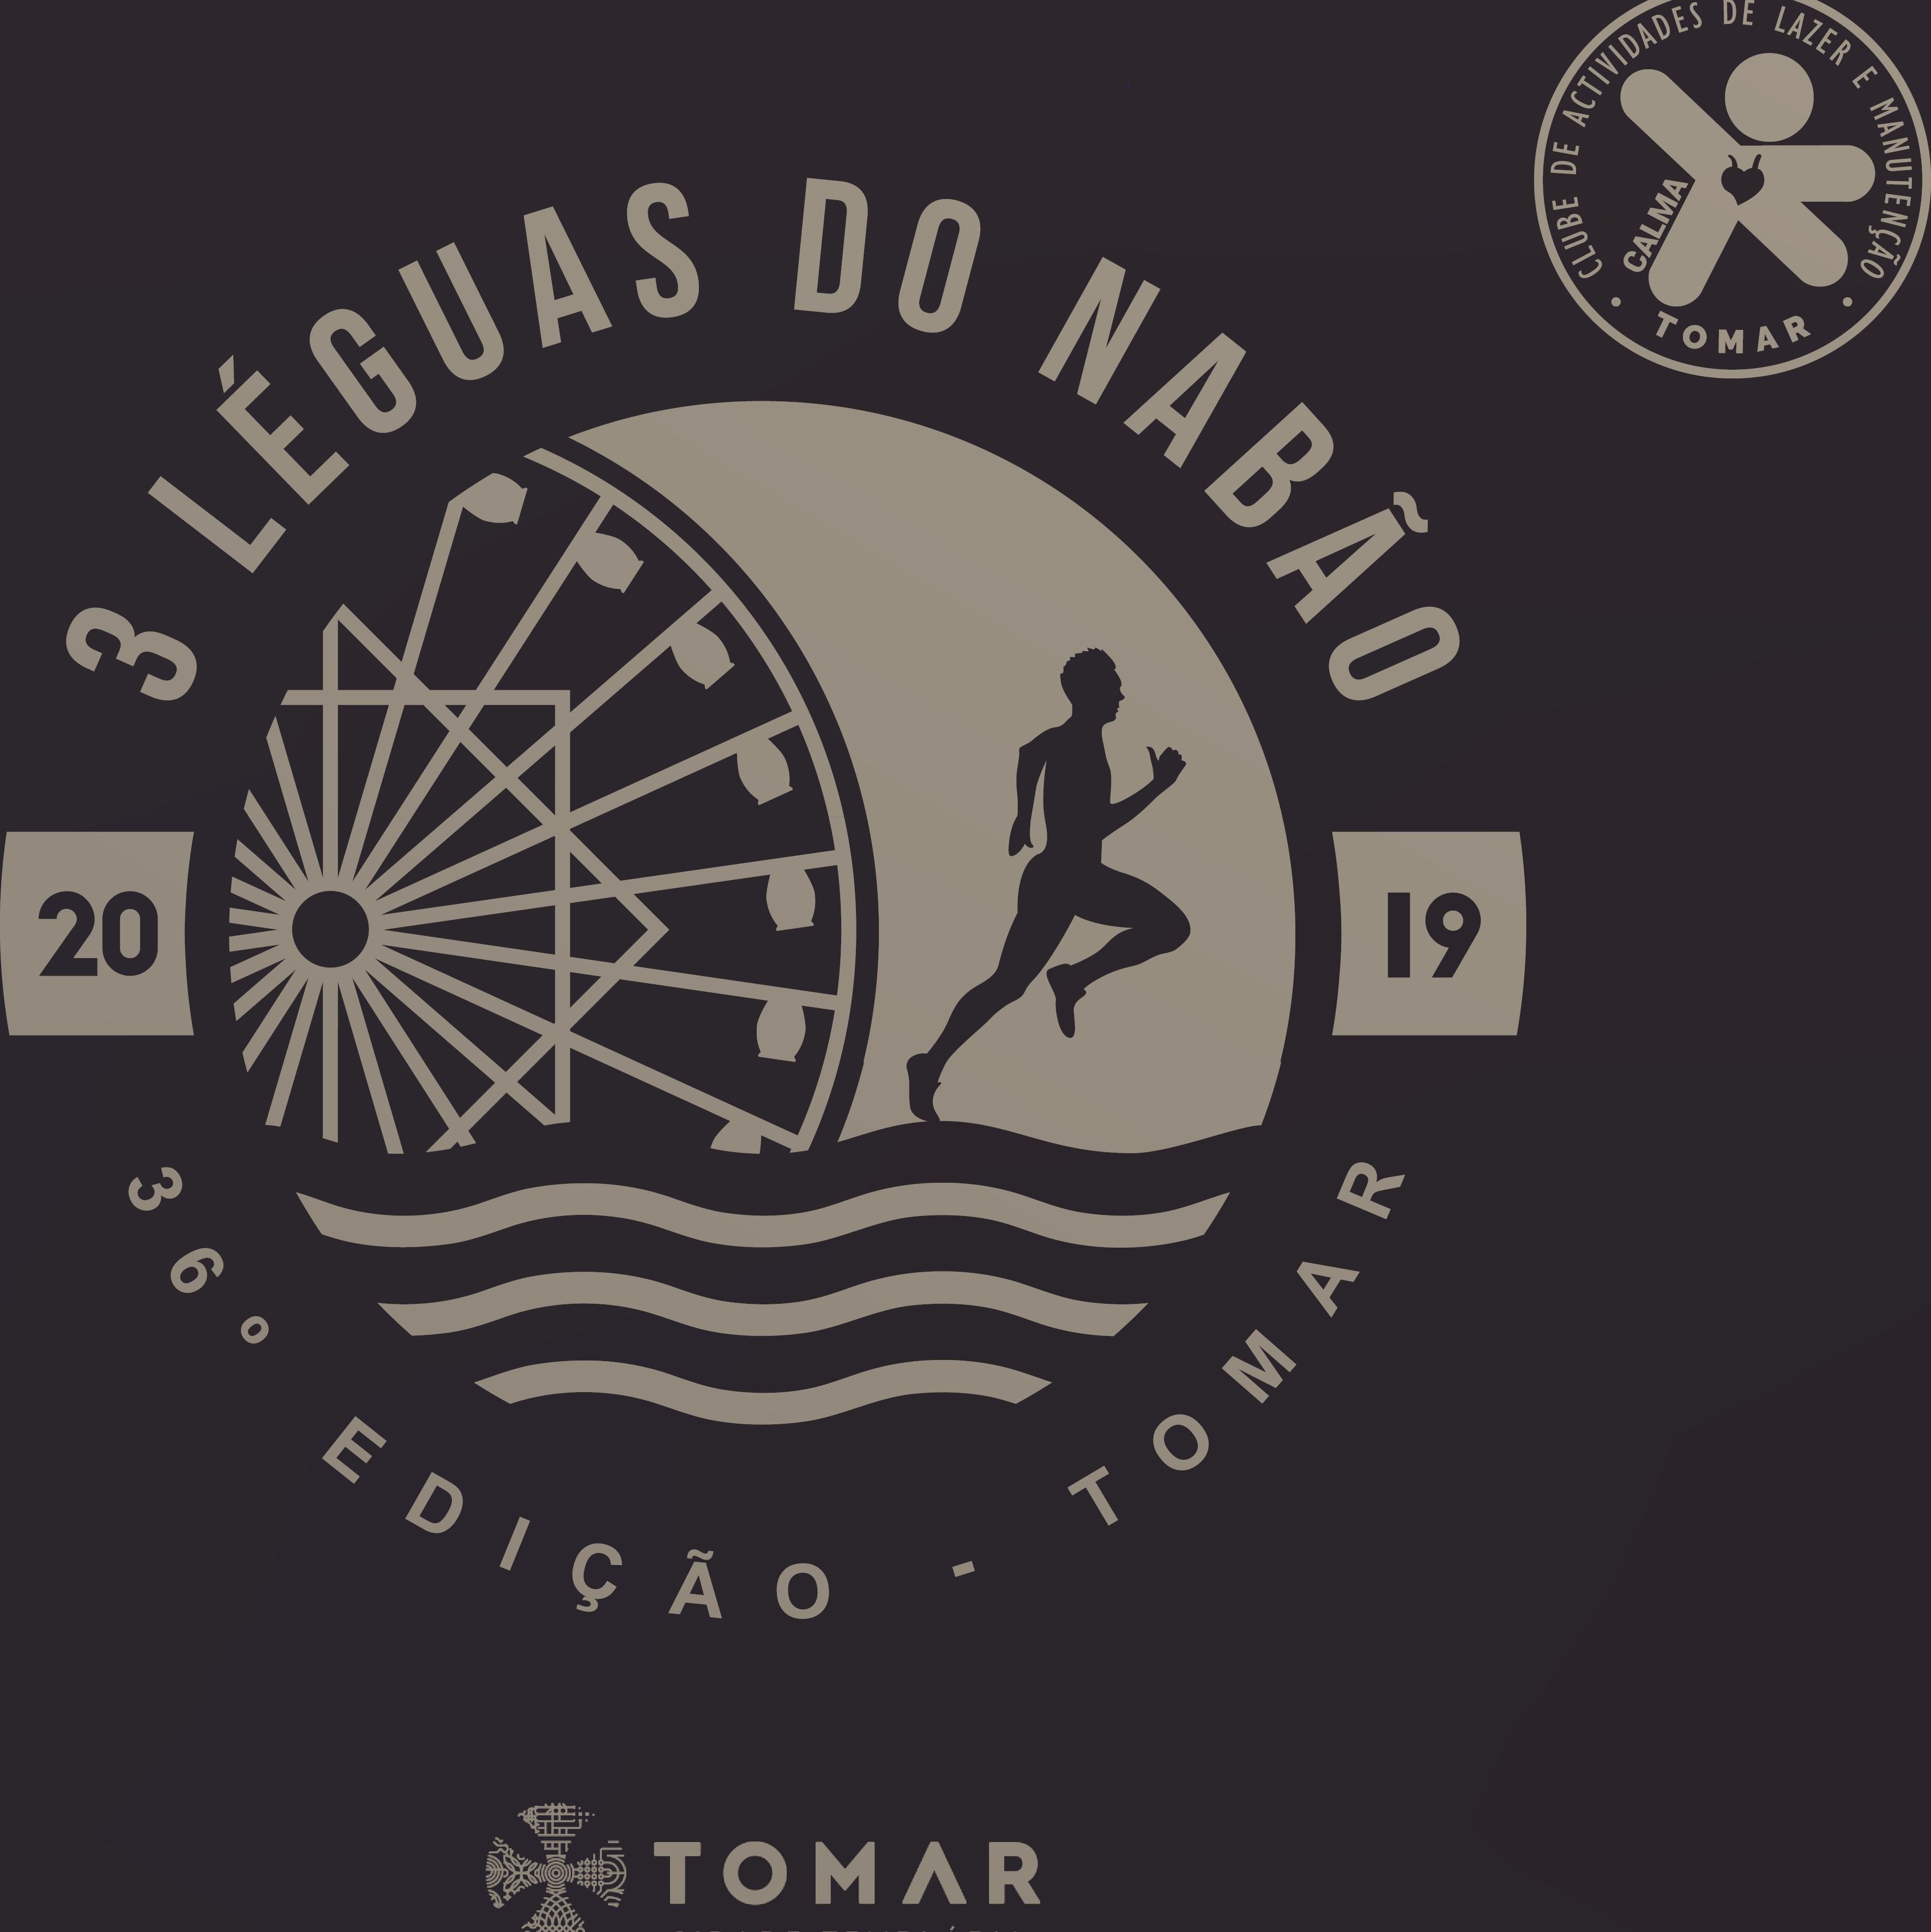 logotipo 2019